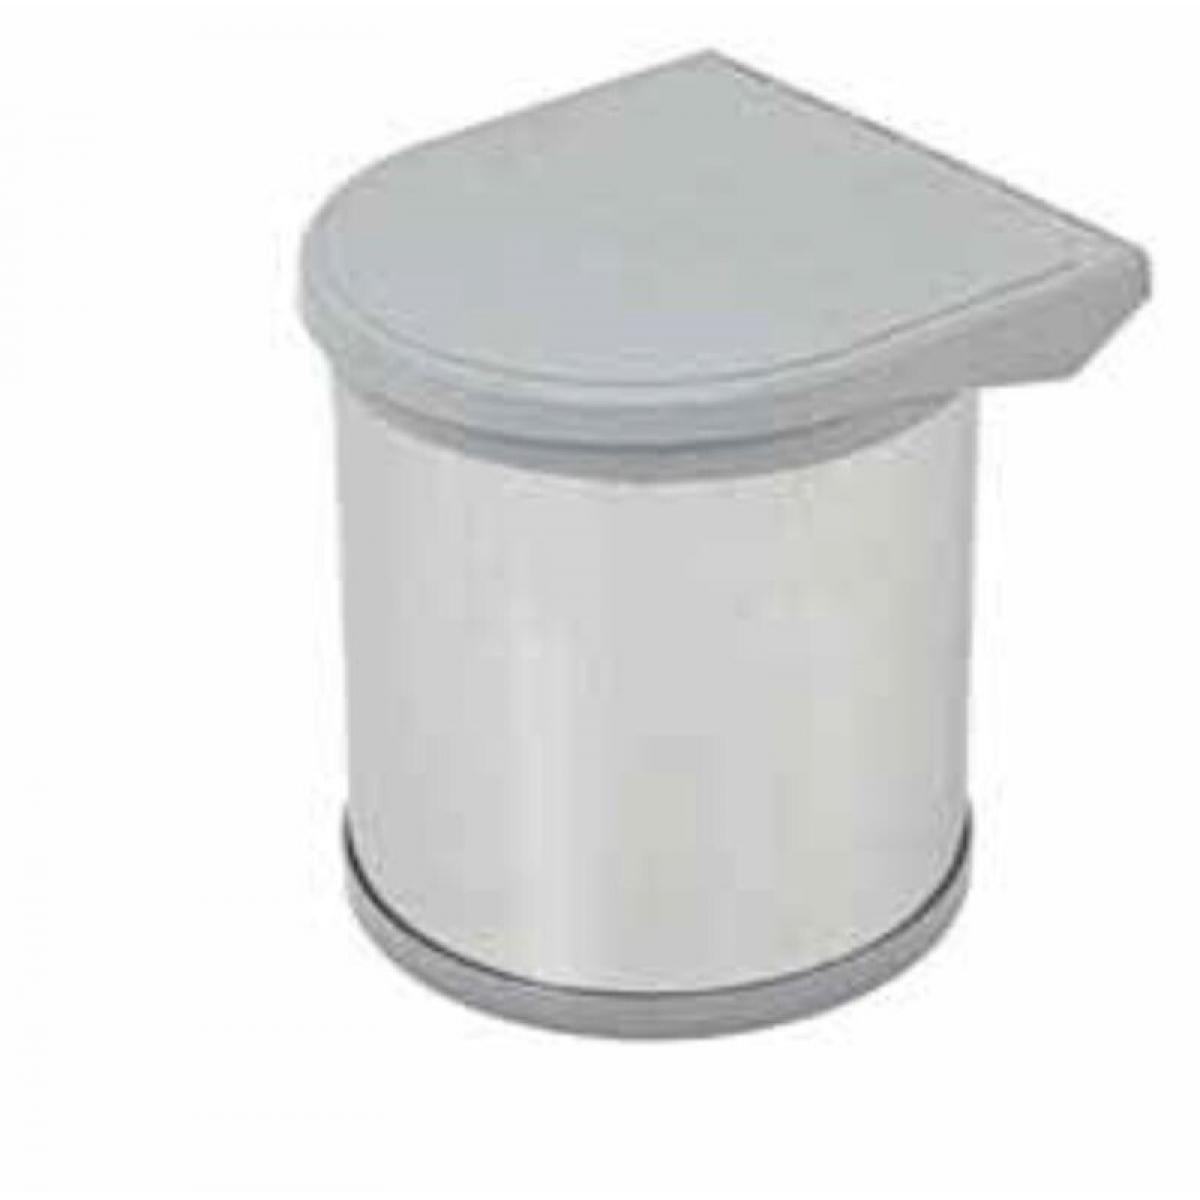 Ведро для базы от 400мм, 10л, пластик/нерж.сталь, *цвет- серый